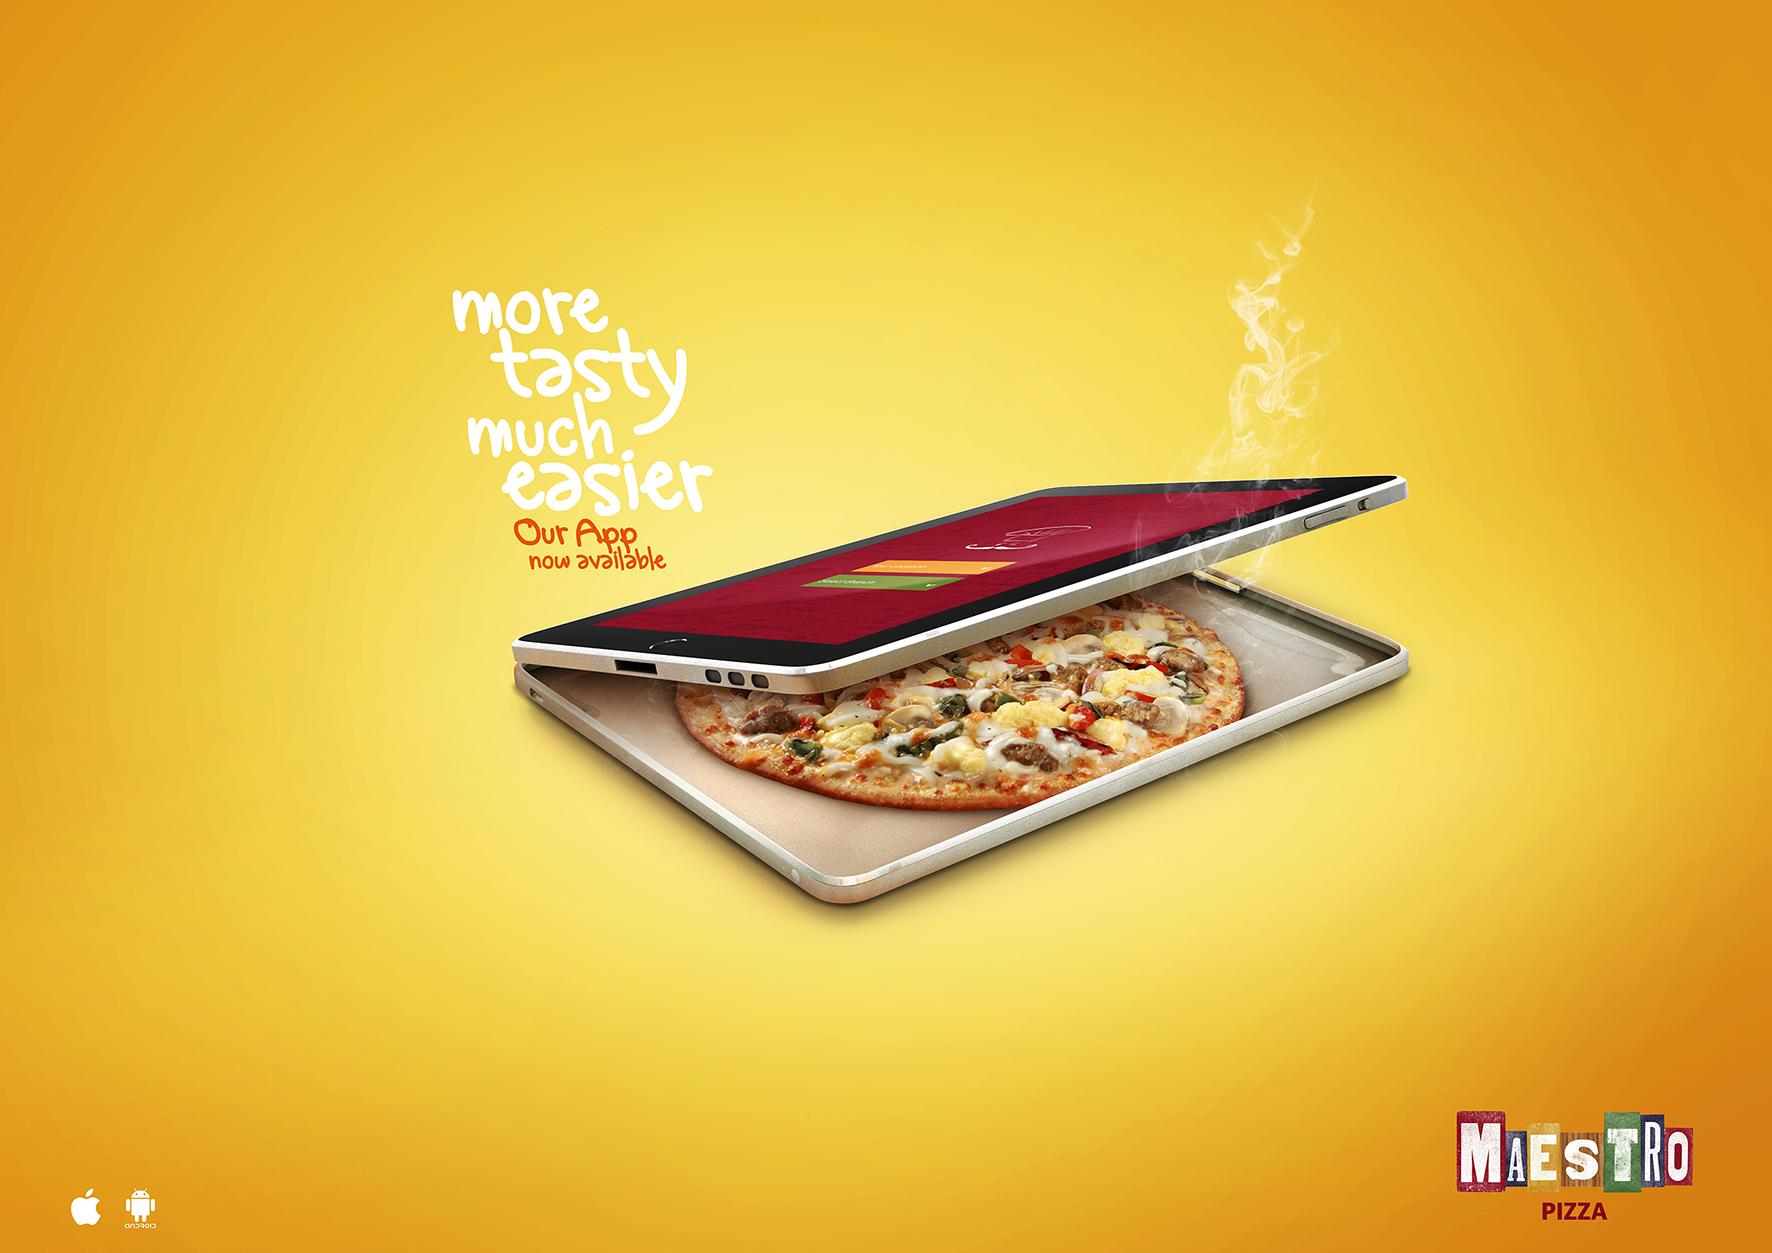 Maestro Pizza Digital